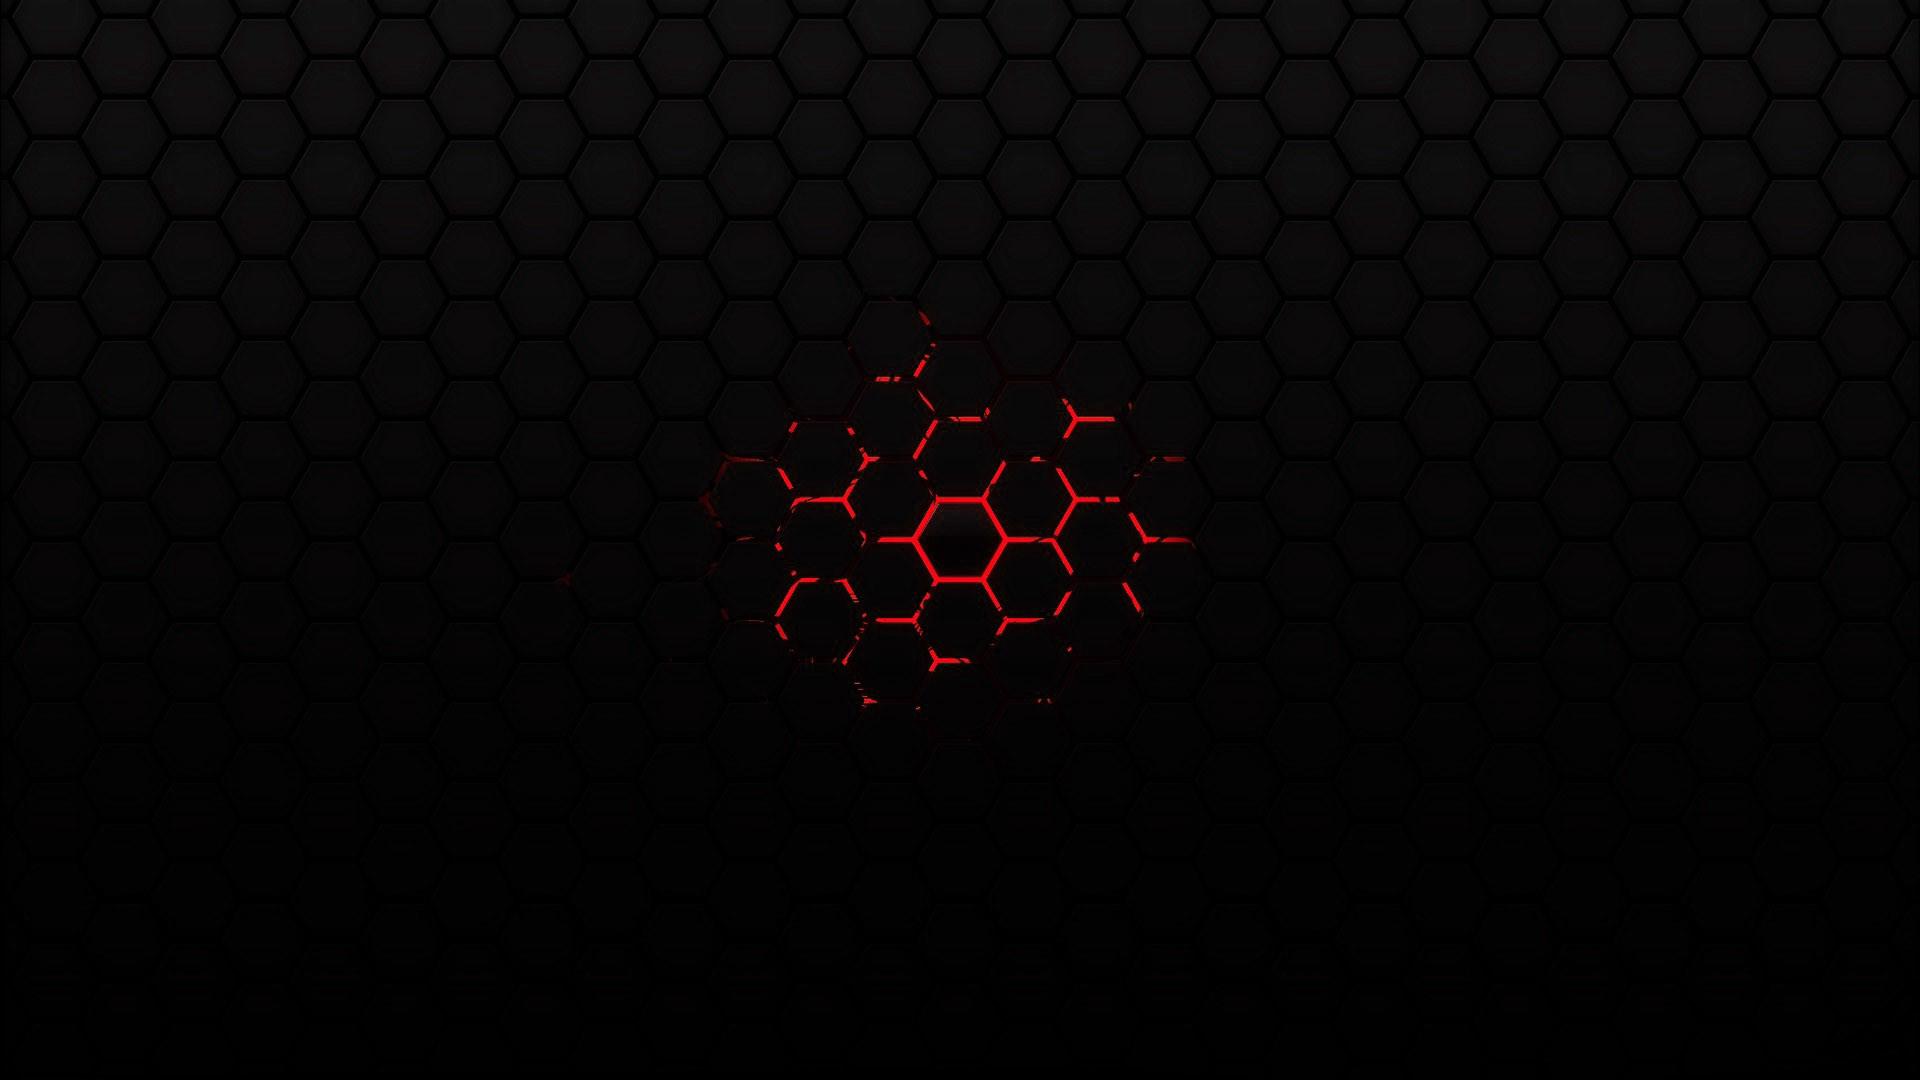 Black Red Wallpaper Black, Red, Black, Background